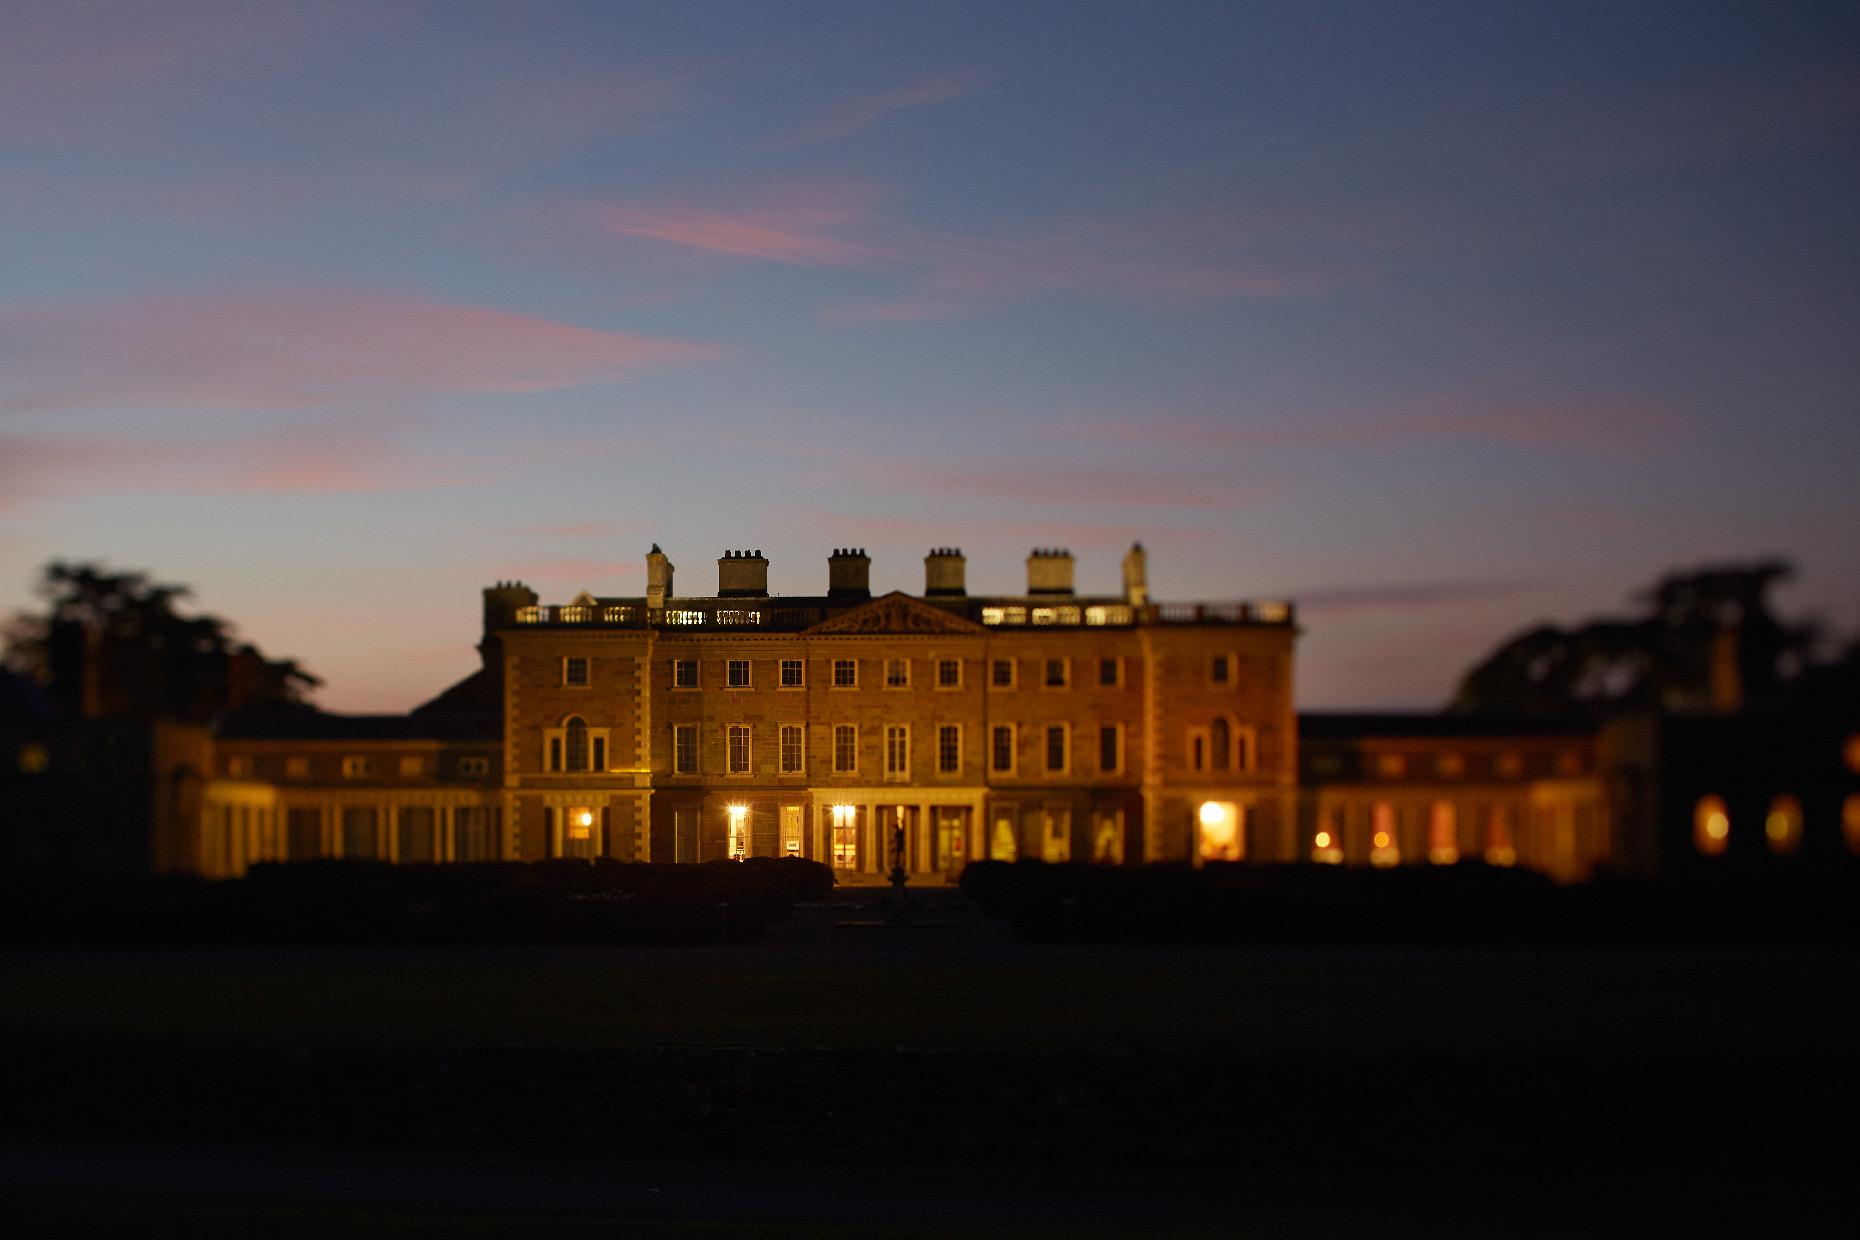 Stacey Van Berkel Photography I Carton House at twilight I Kildare, Ireland